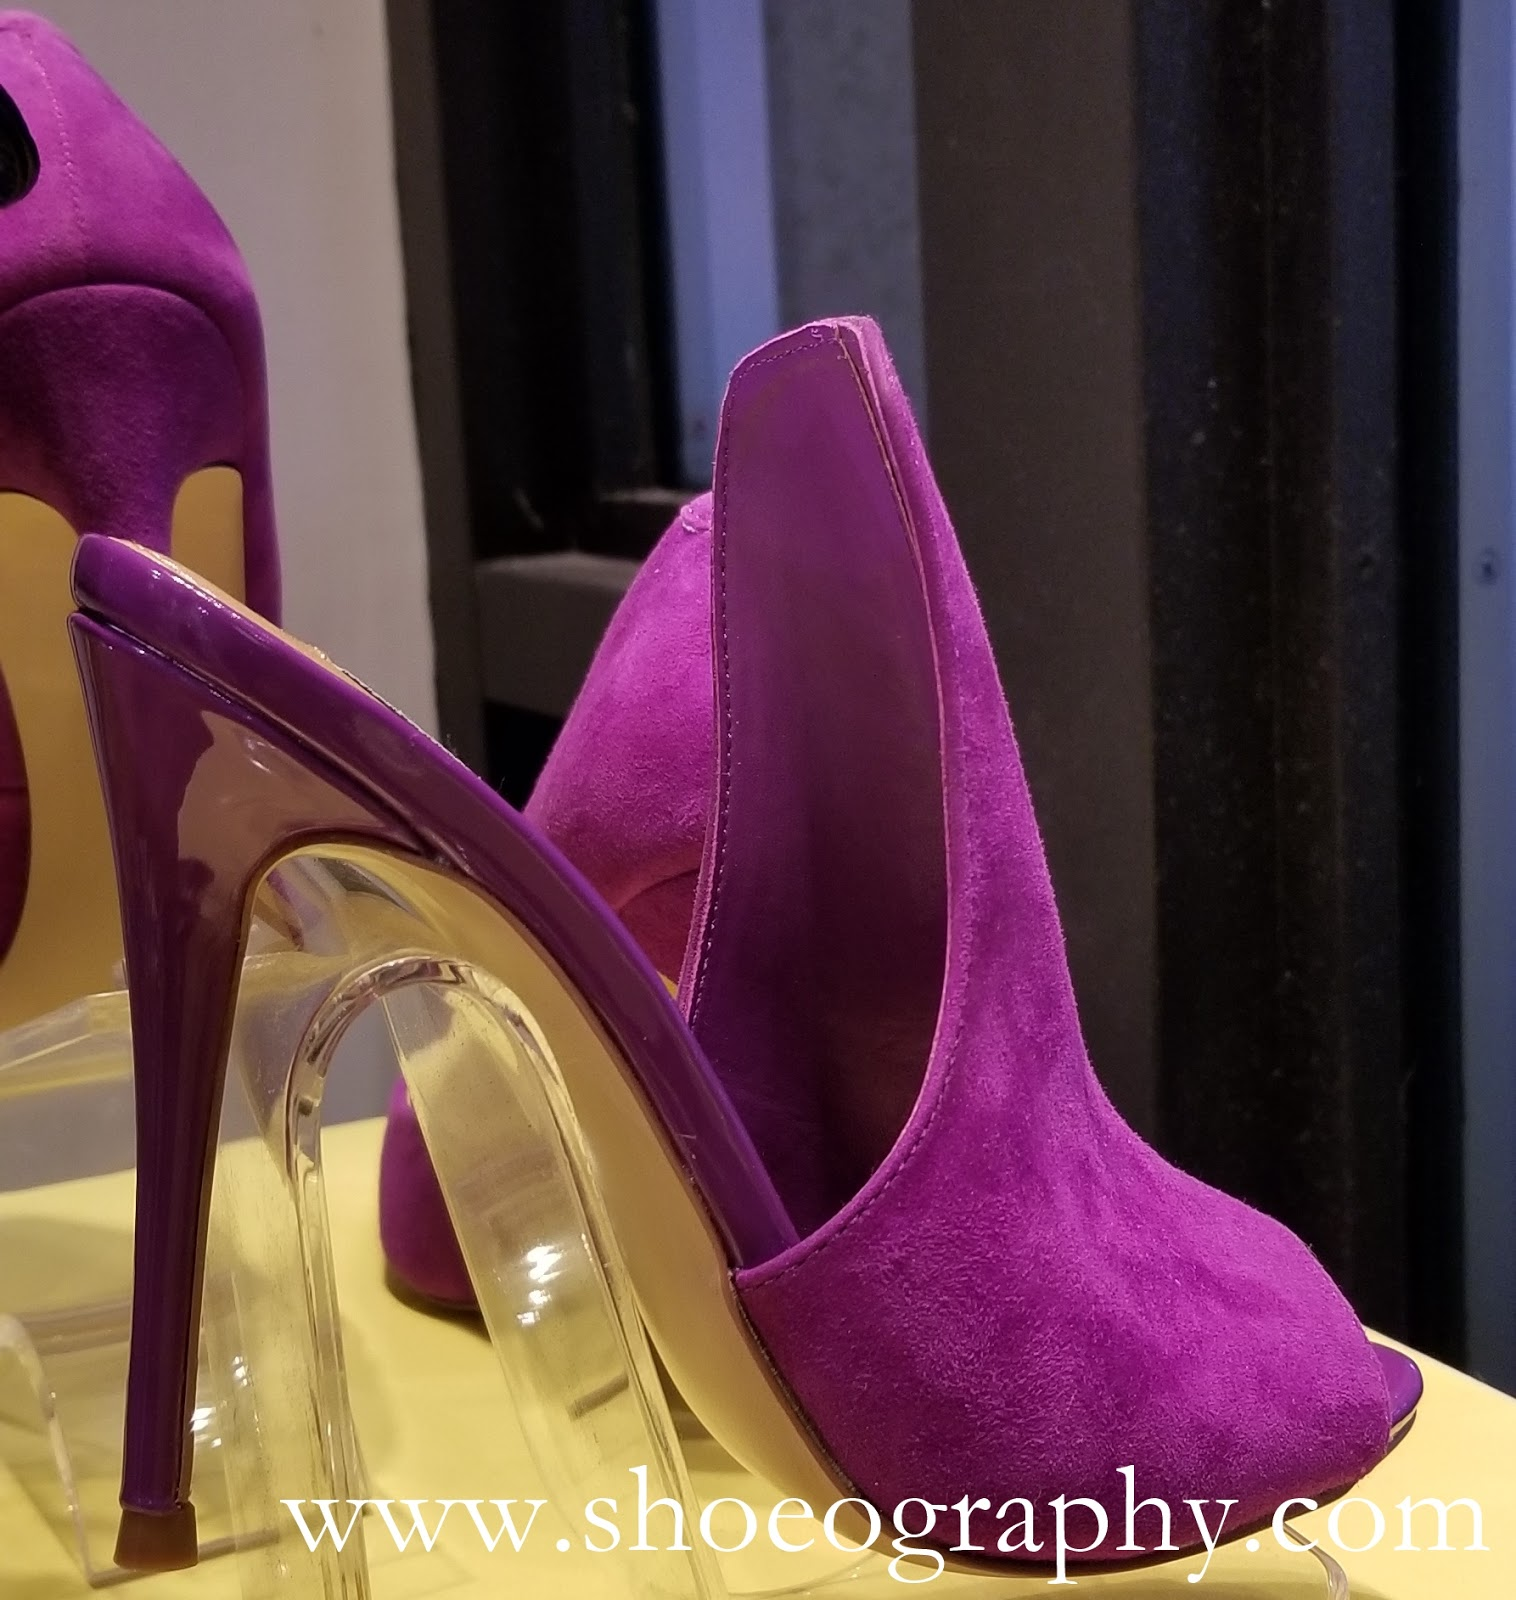 89b4eba7234 Shoe of the Day